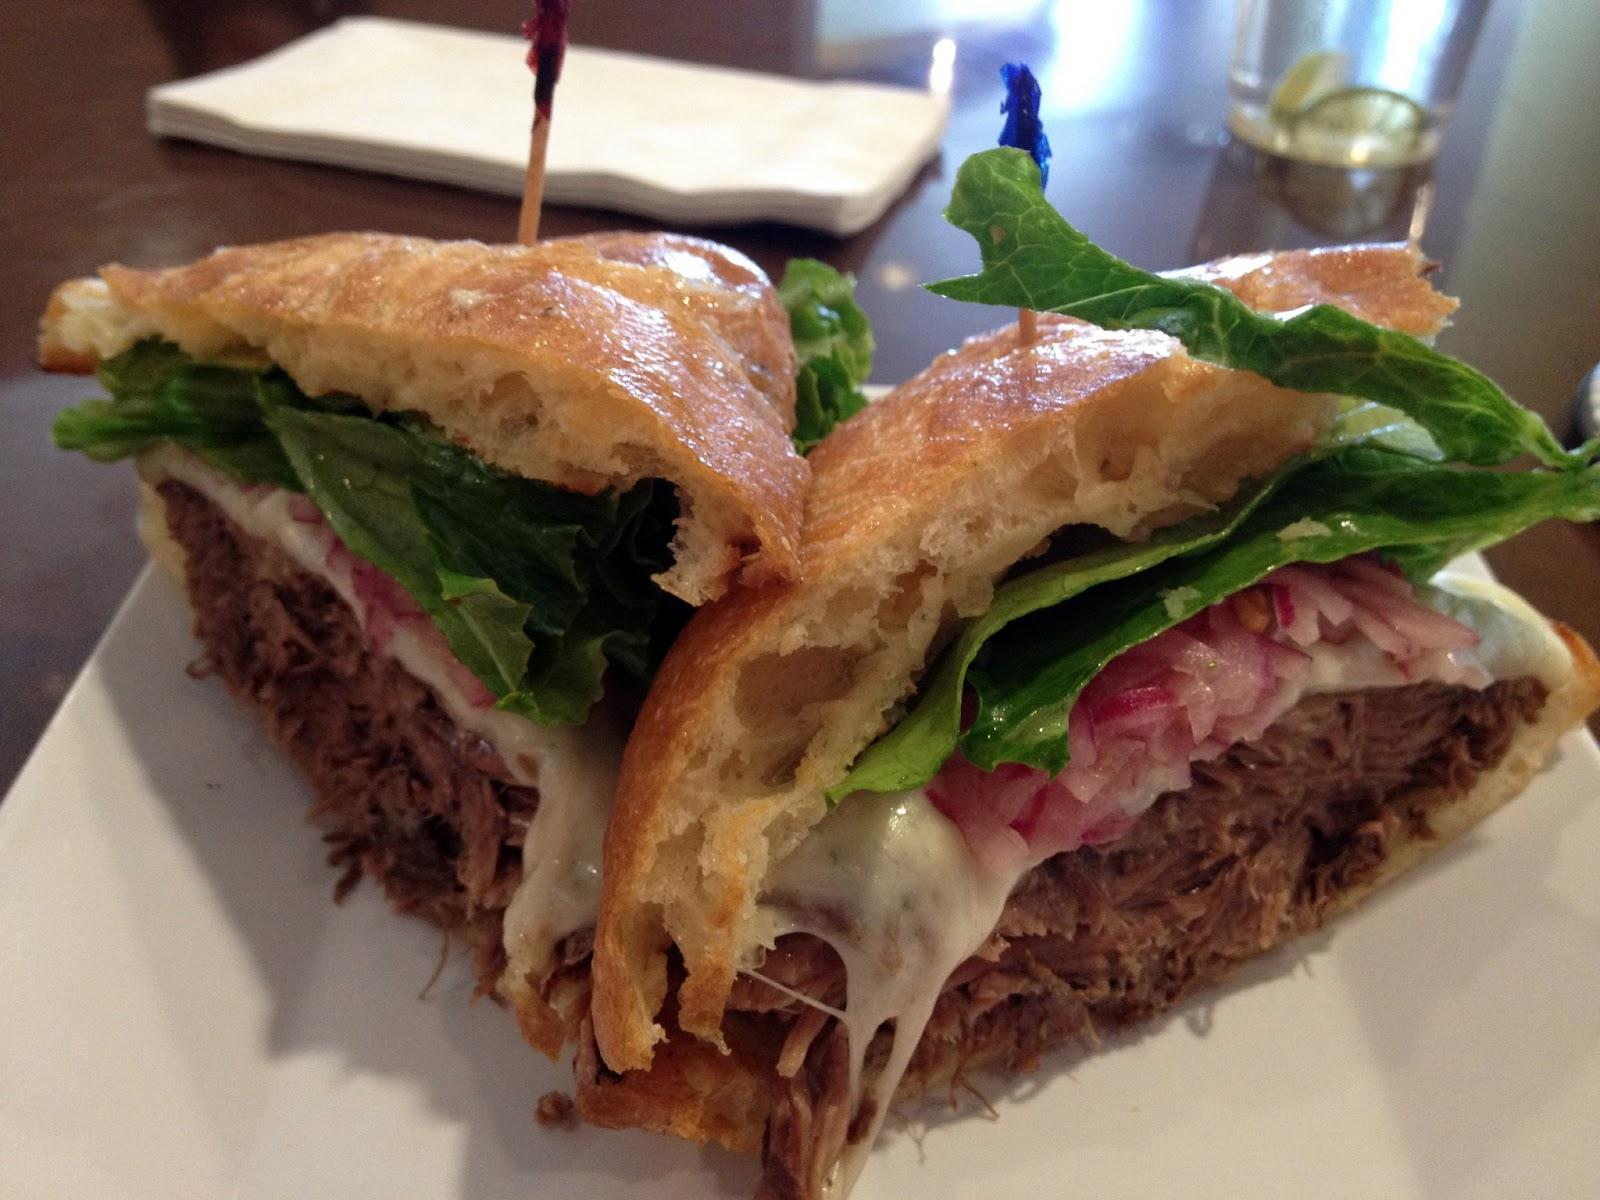 food blogger, utah food reviews, food in utah, places to eat in utah, blue lemon, artisan sandwich, slow braised short rib, short ribs,